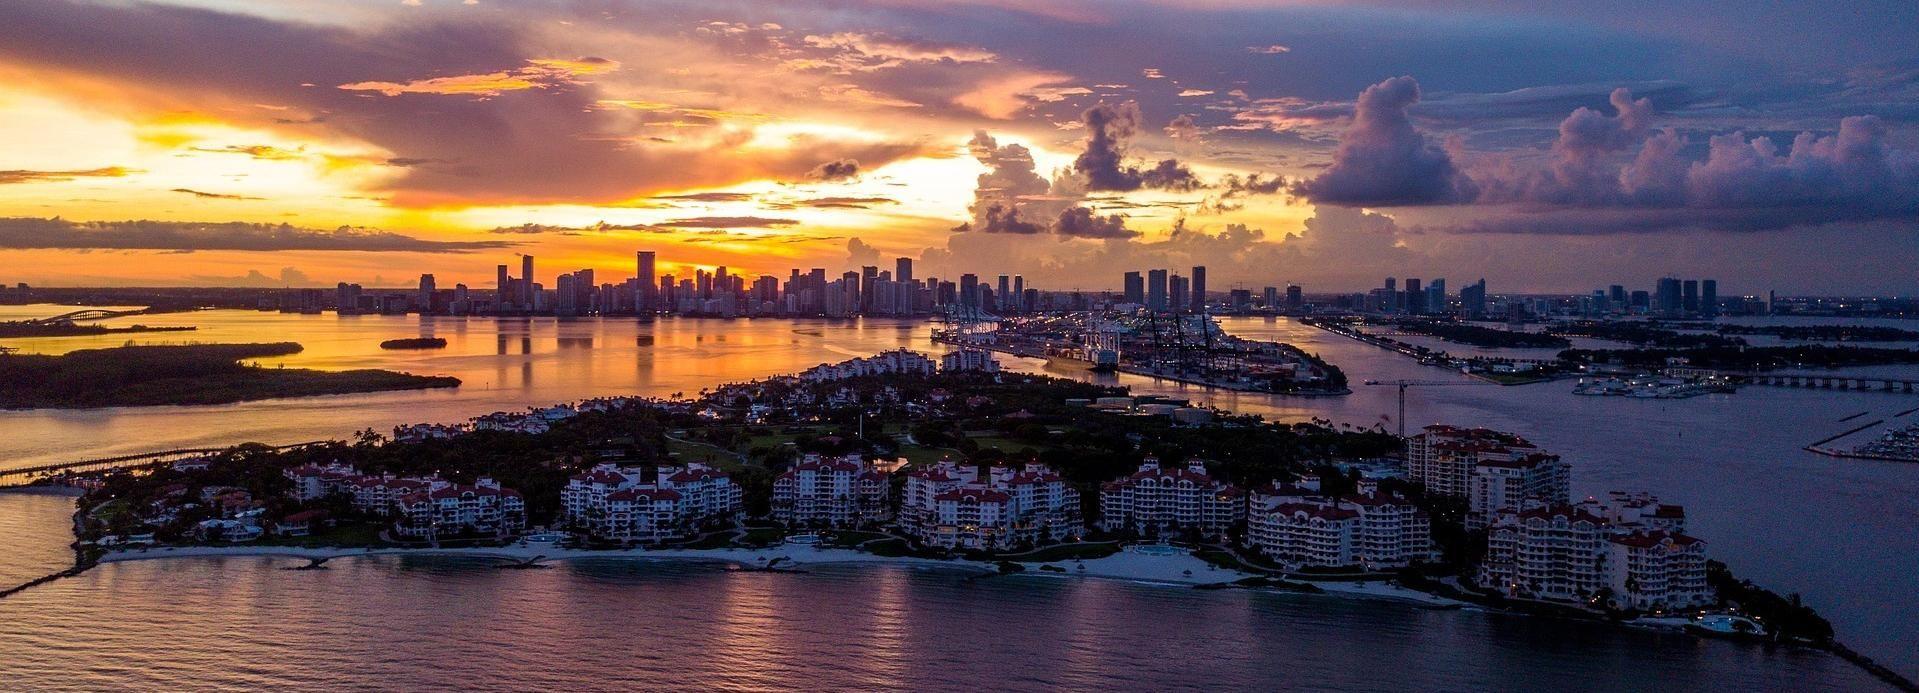 Miami: Sunset Sightseeing Airplane Tour